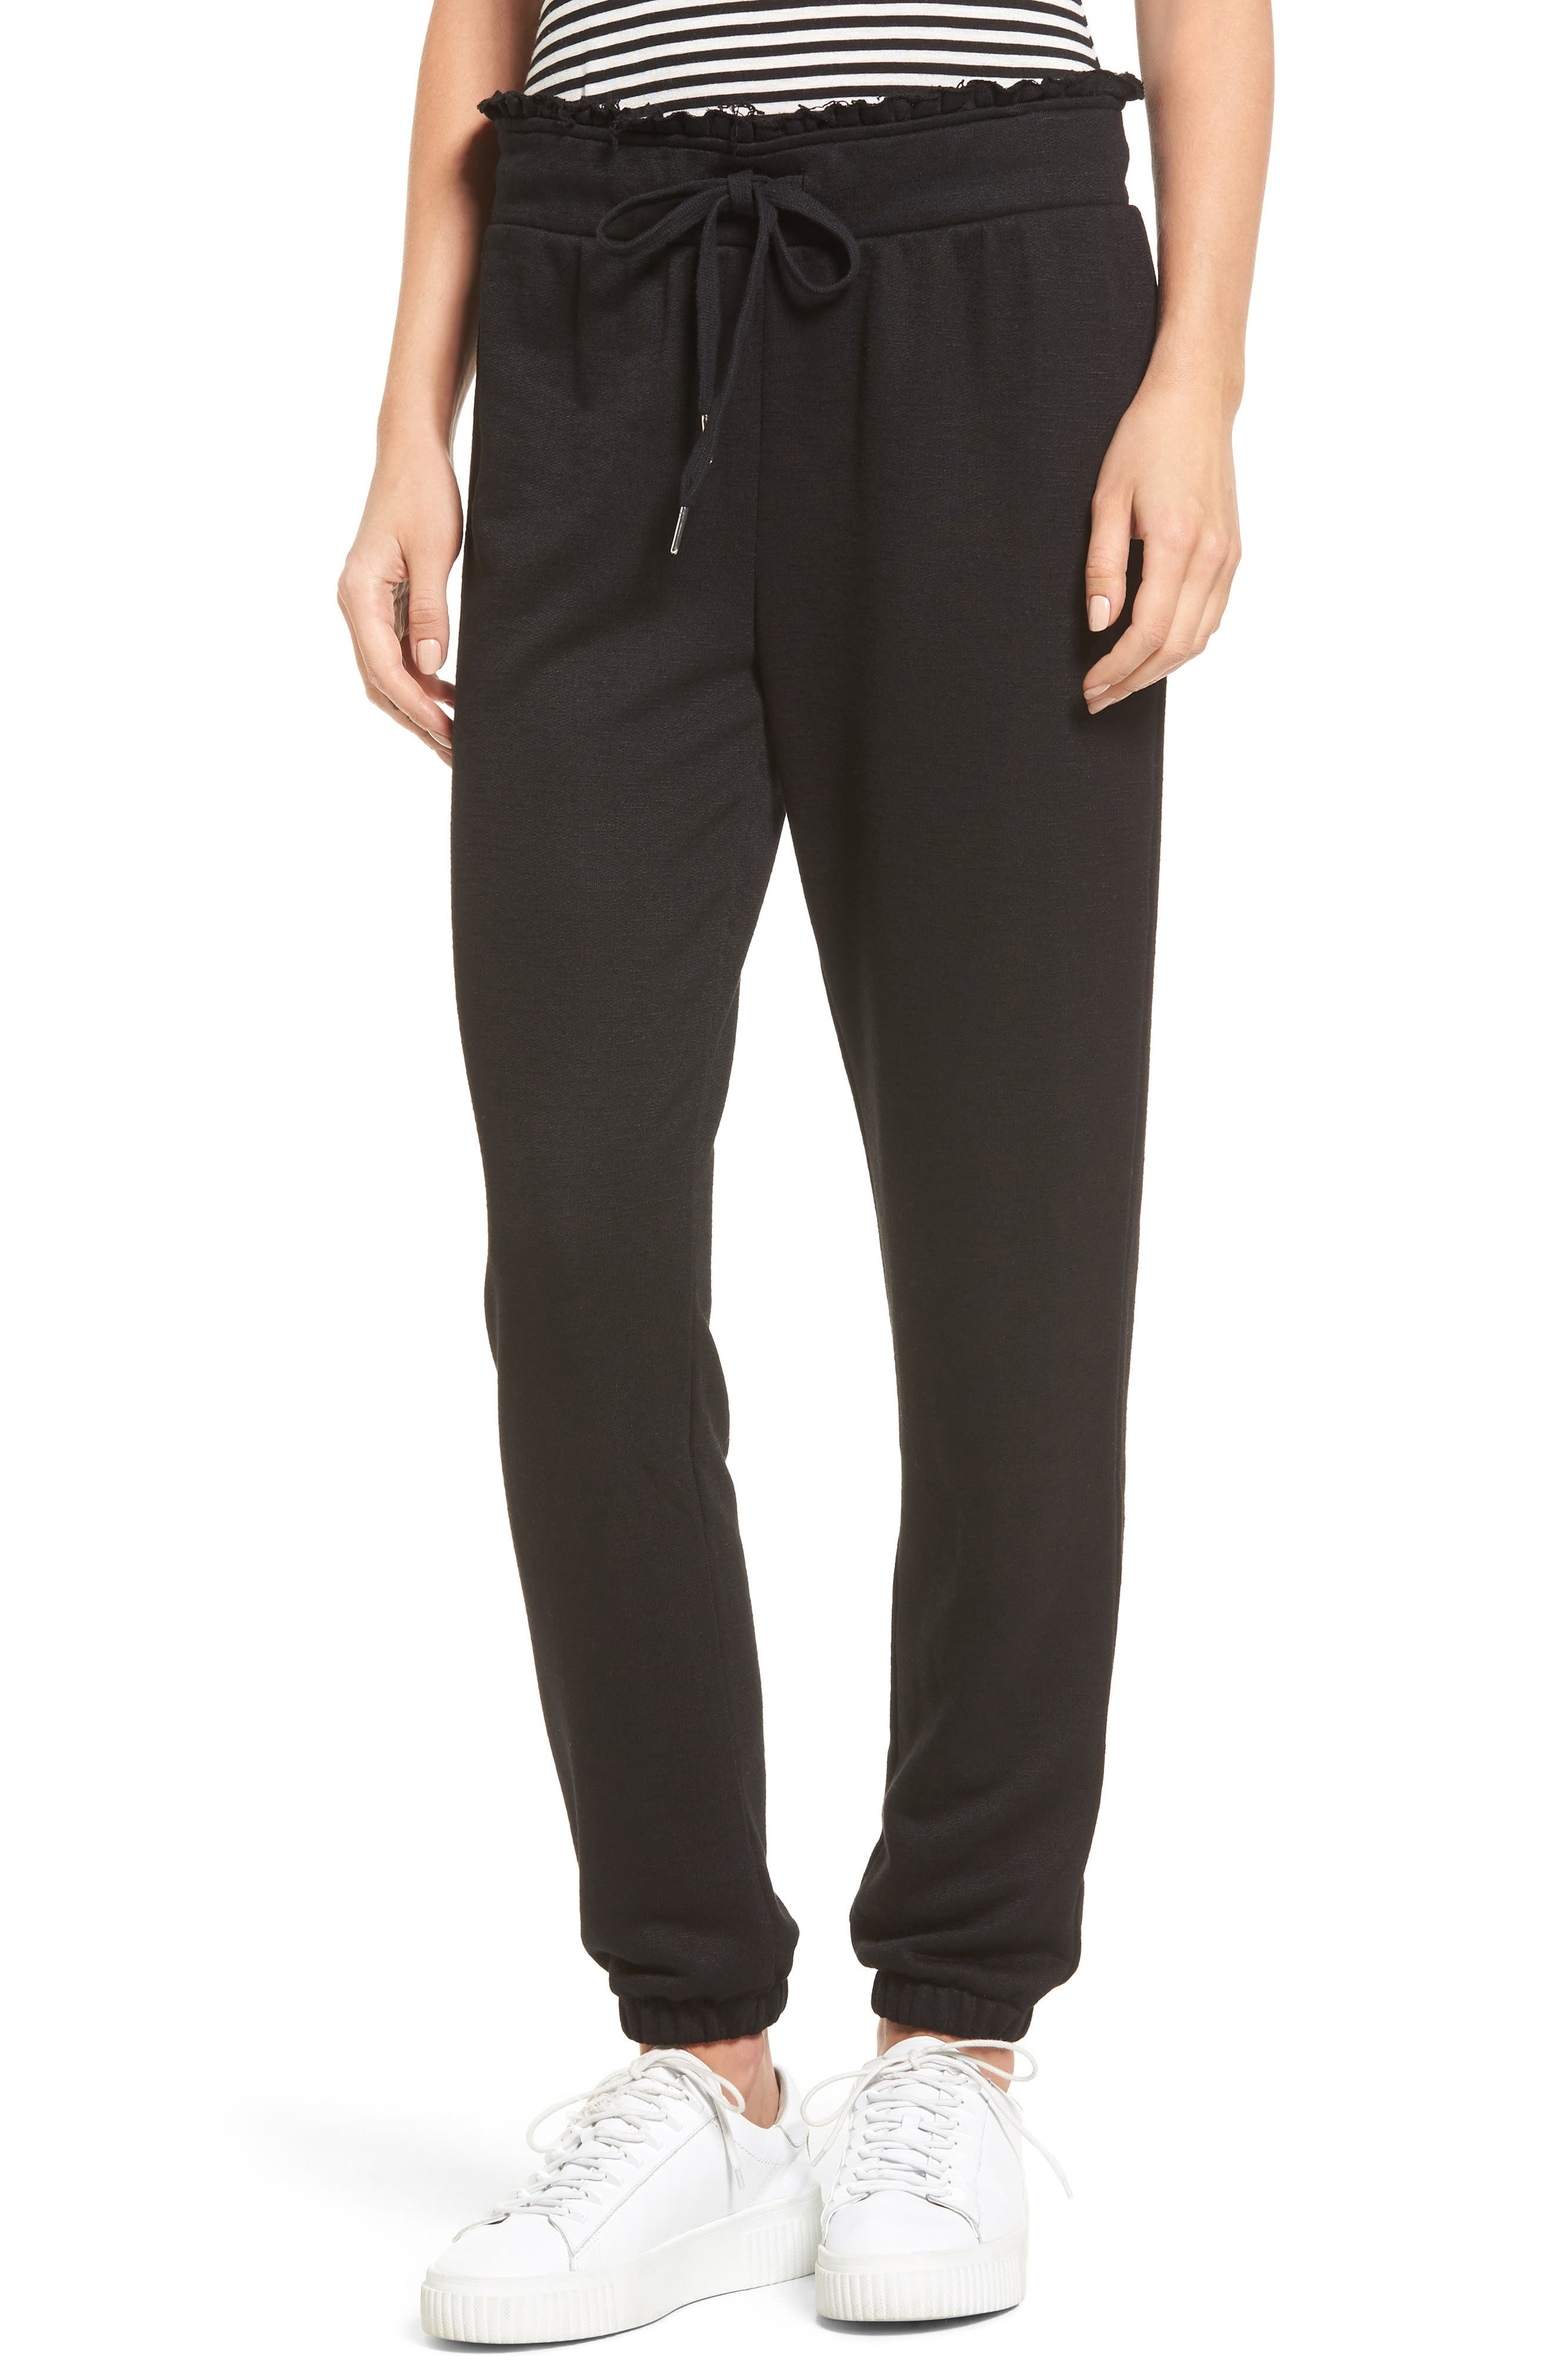 Raw Edge Sweatpants,                         Main,                         color, Black